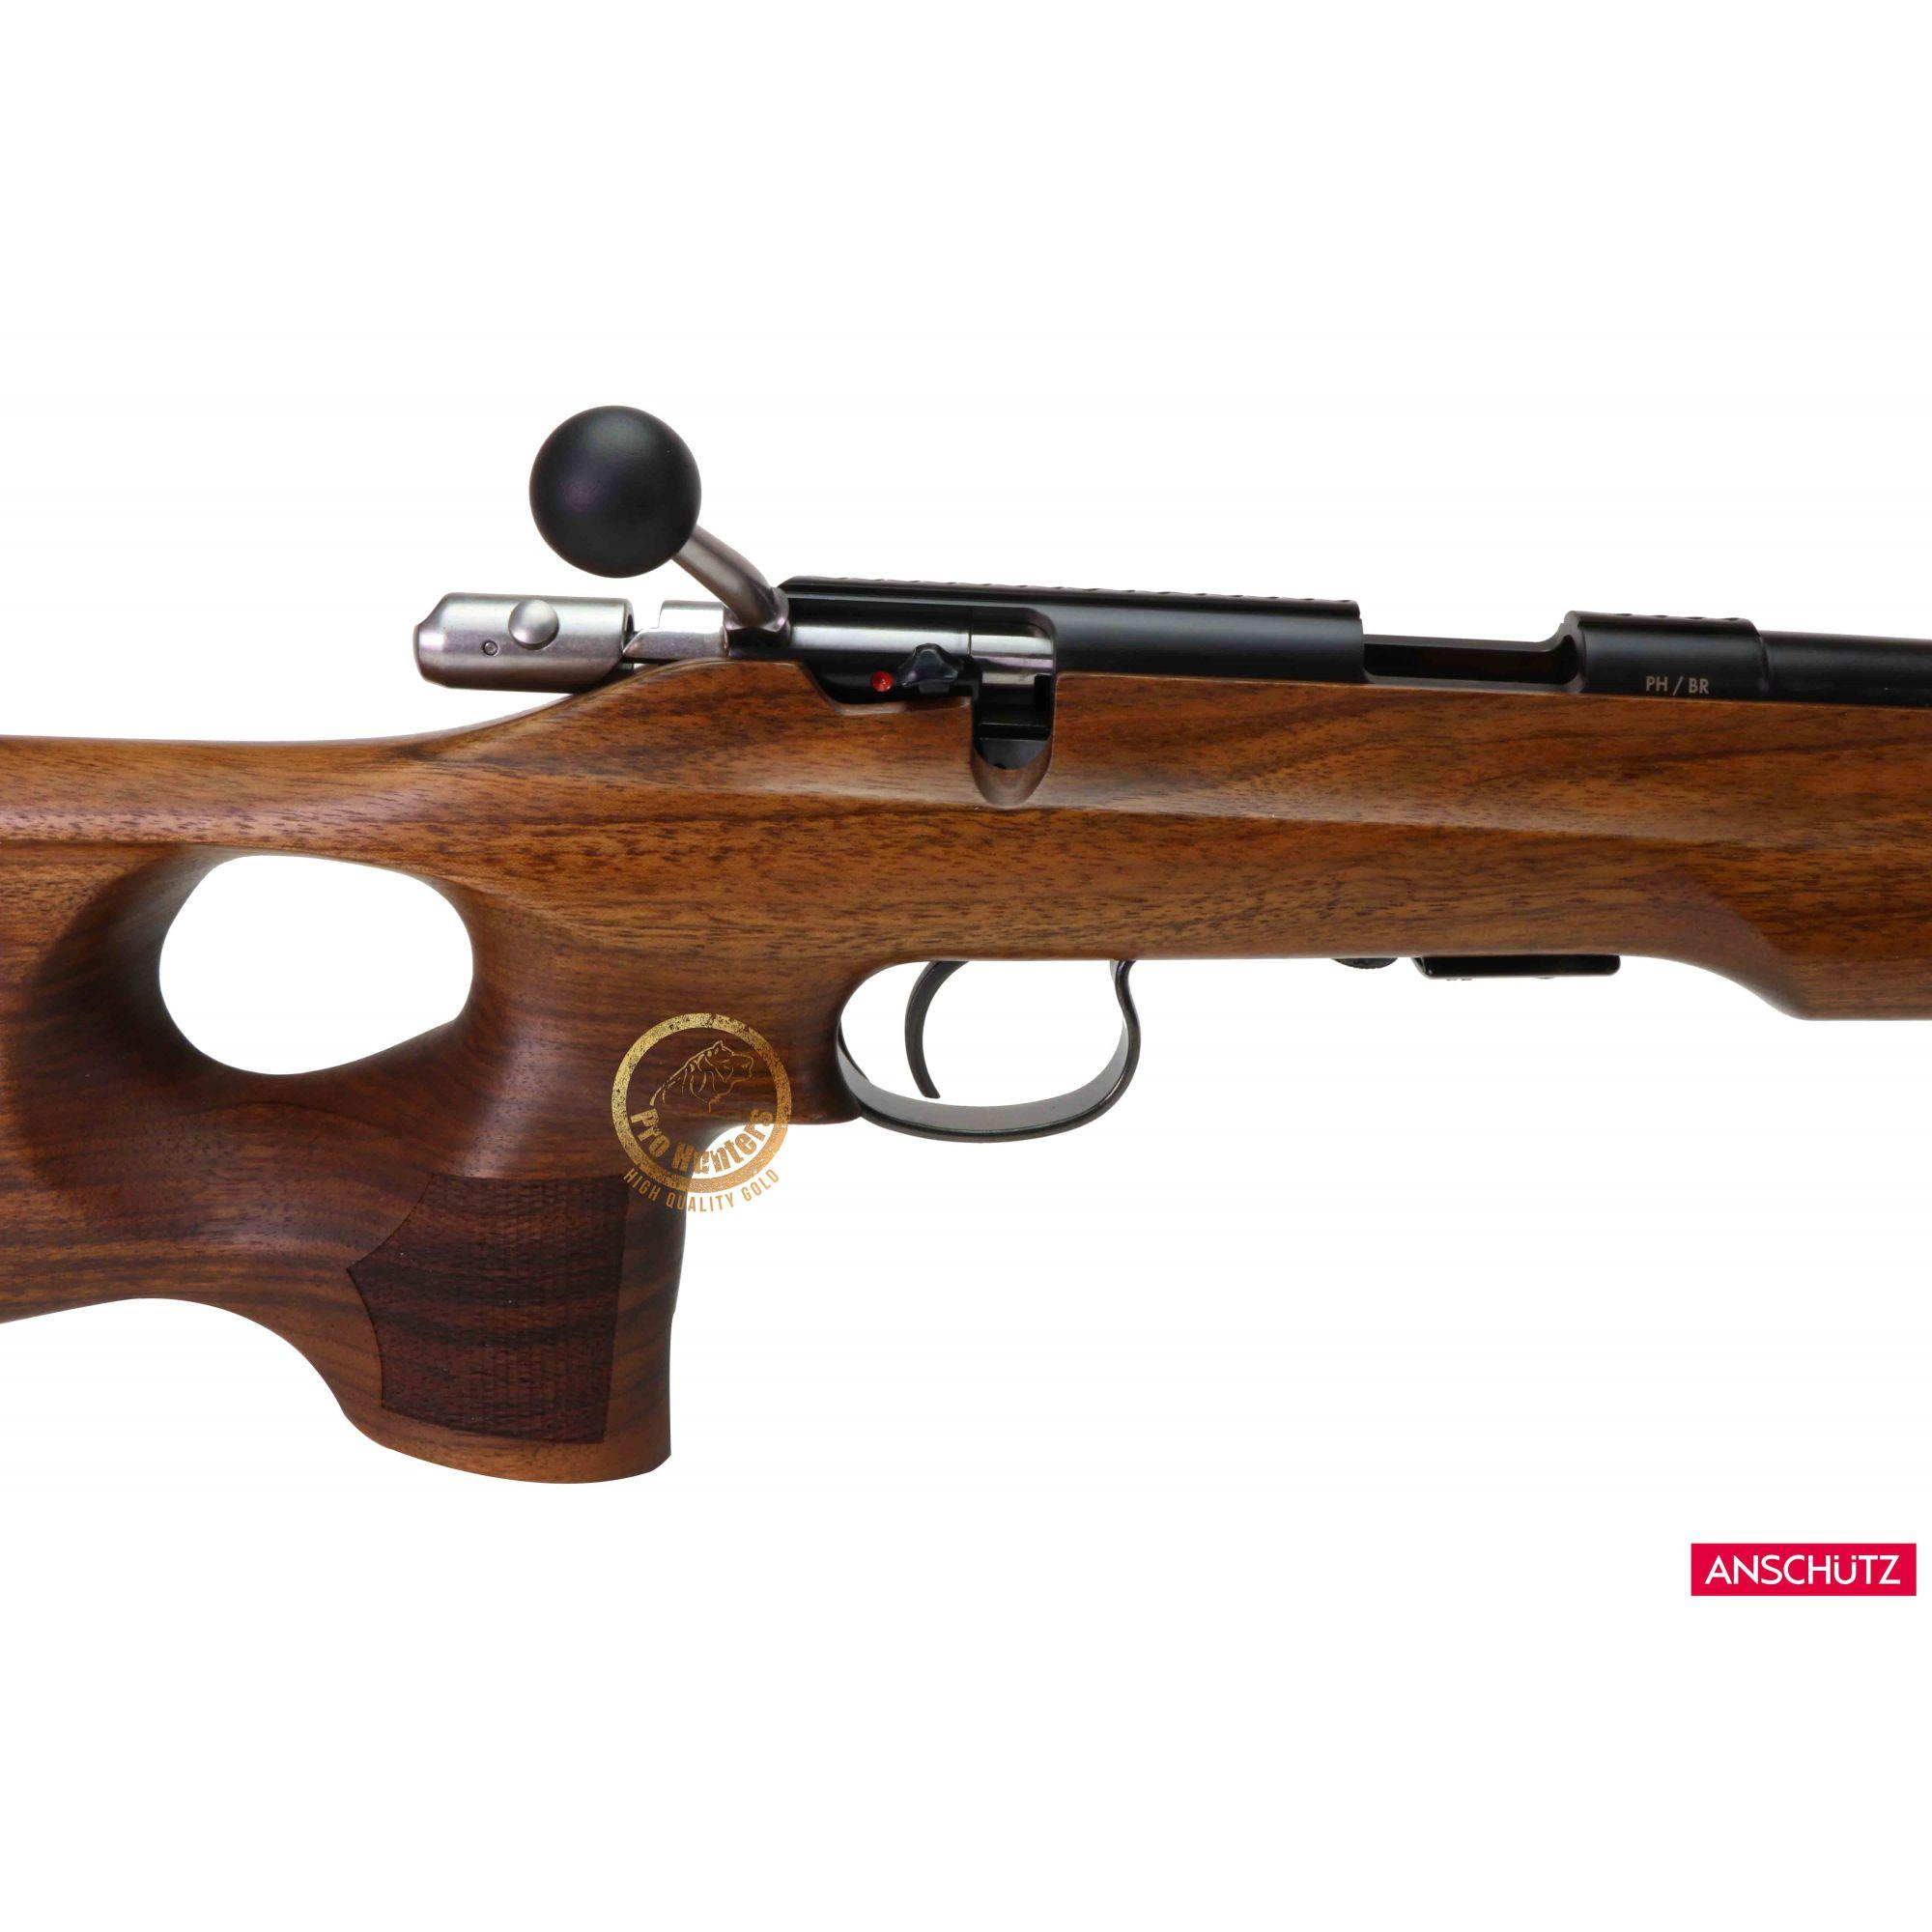 Rifle Anschutz 1416 D HB Thumbhole Stock - 18 Polegadas - Calibre .22 LR